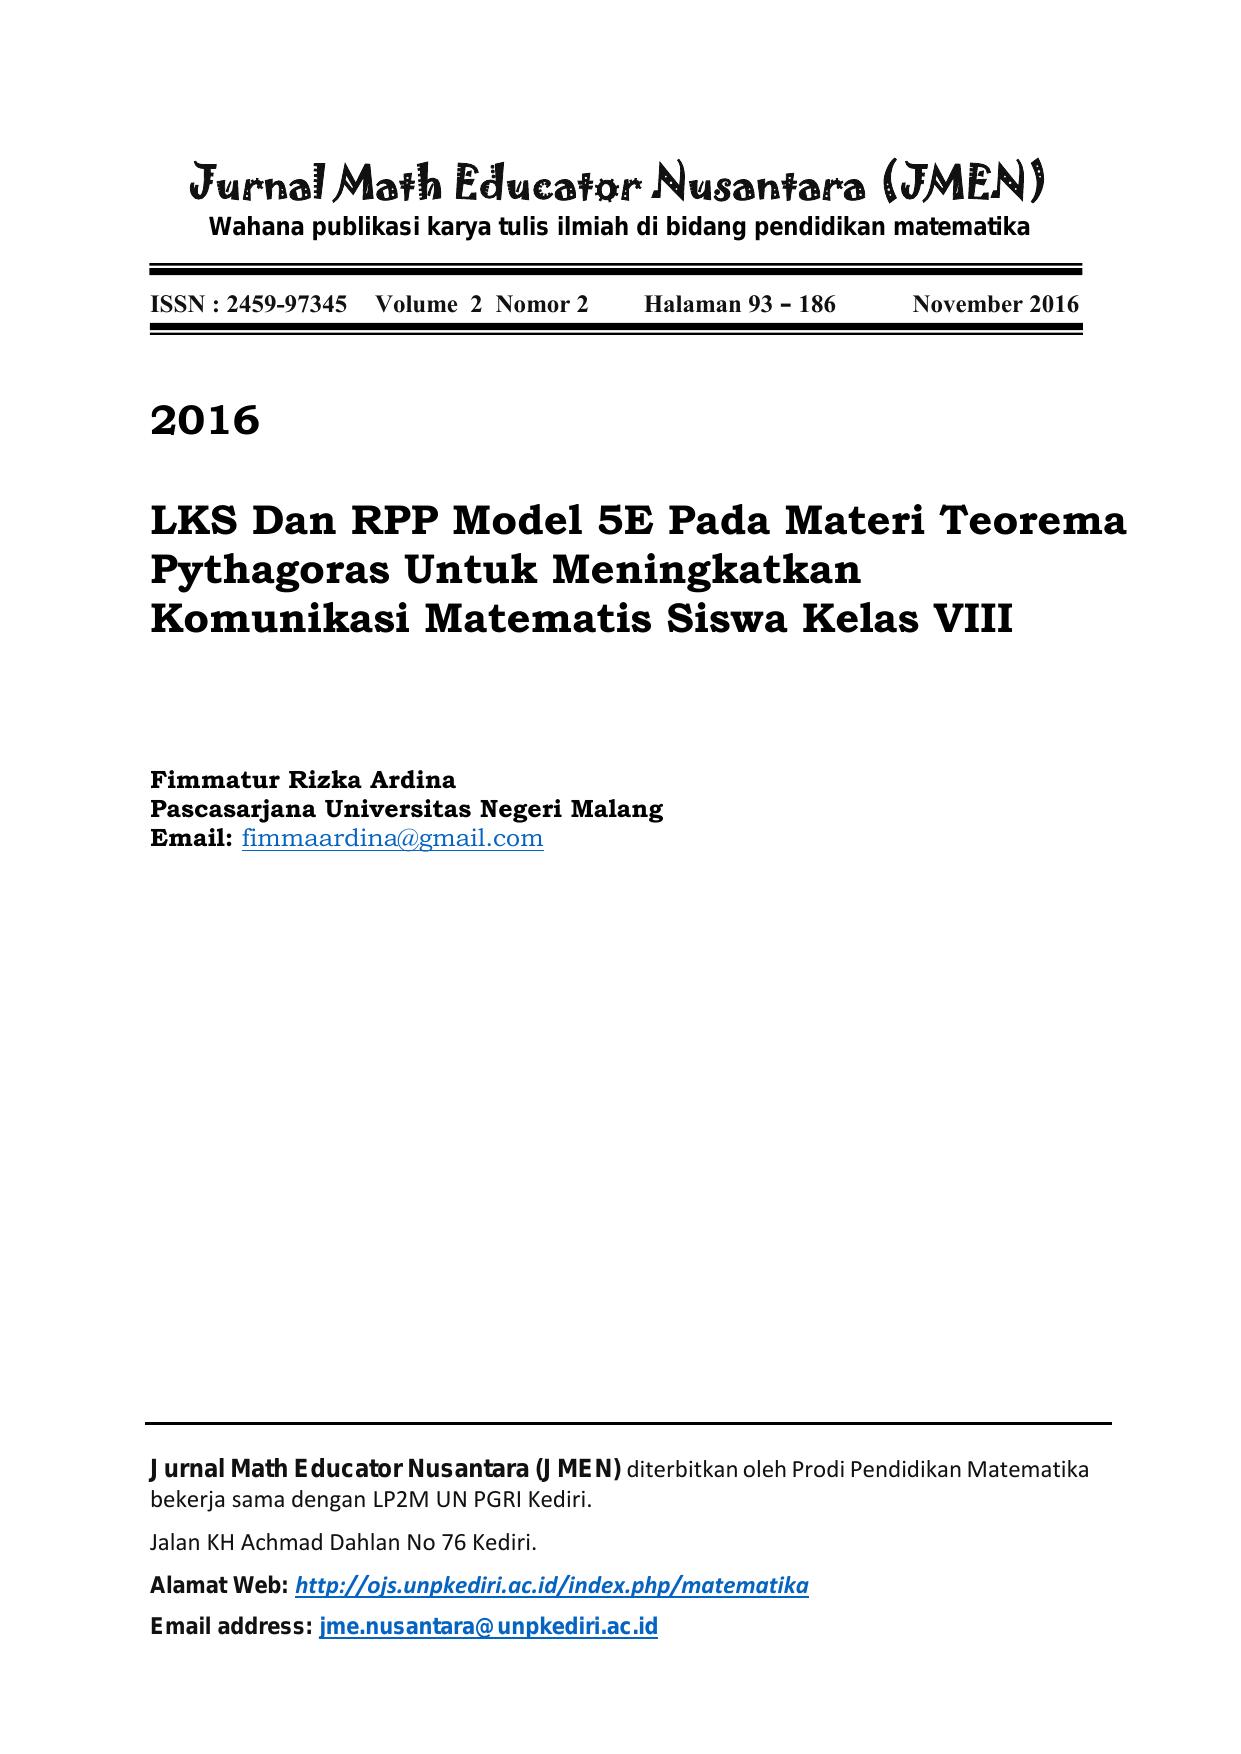 2016 Lks Dan Rpp Model 5e Pada Materi Teorema Pythagoras